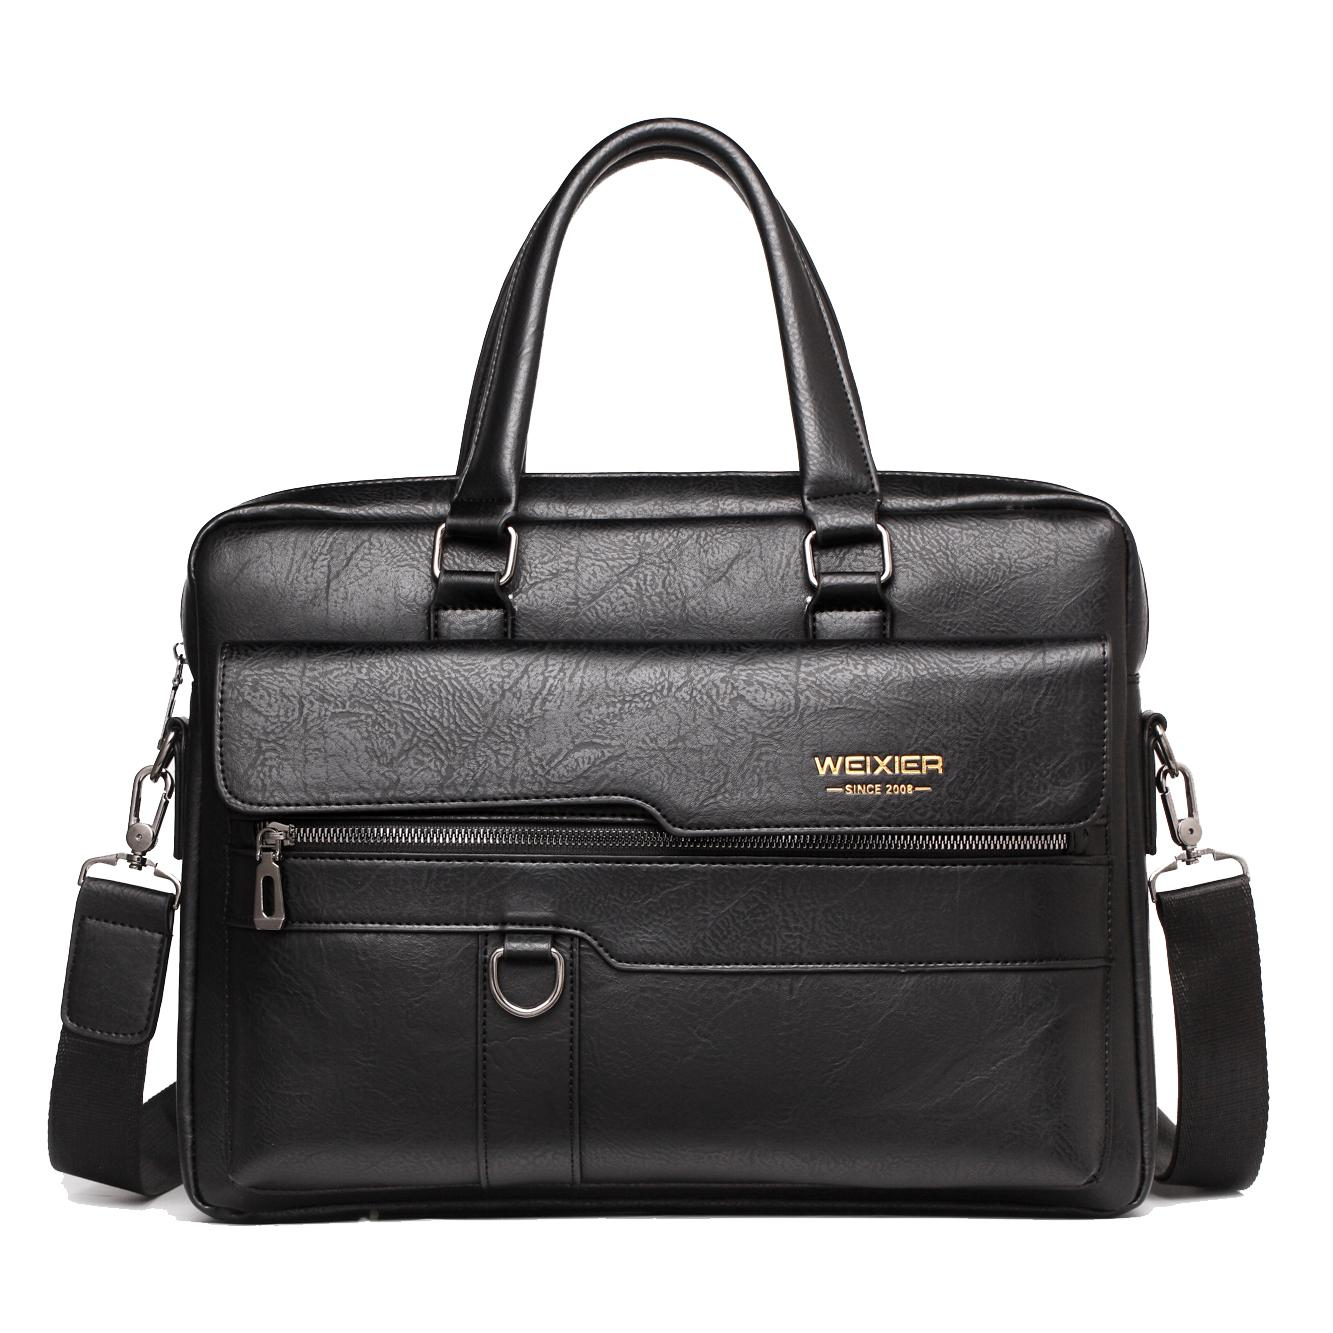 saco Crossbody Ombro Bolsa de Negócios Men Messenger Bag Marca WEIXIER vintage PU de couro para homens Moda Casual Man Bolsas